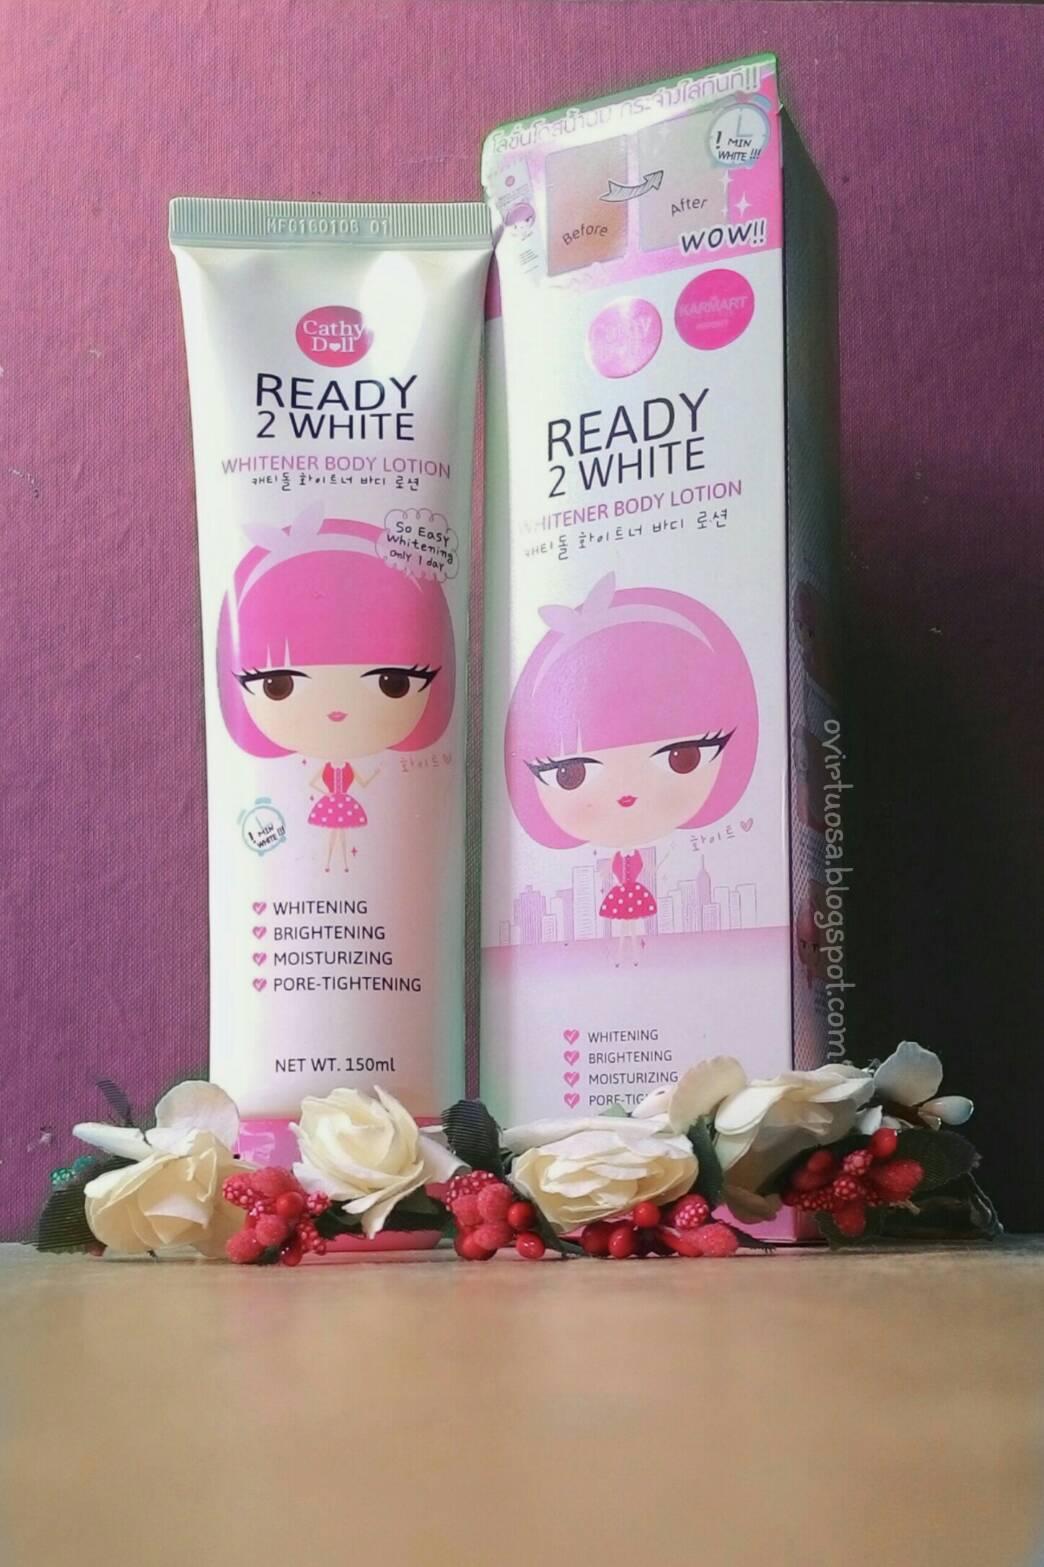 Review Cathy Doll Ready 2 White Whitener Body Lotion 150ml Aku Dari Packagingnya Dulu Yaa Sumpah Lucu Banget Girls Pink Dengan Icon Boneka Khas Tube Warna Dasar Putih Dan Tutup